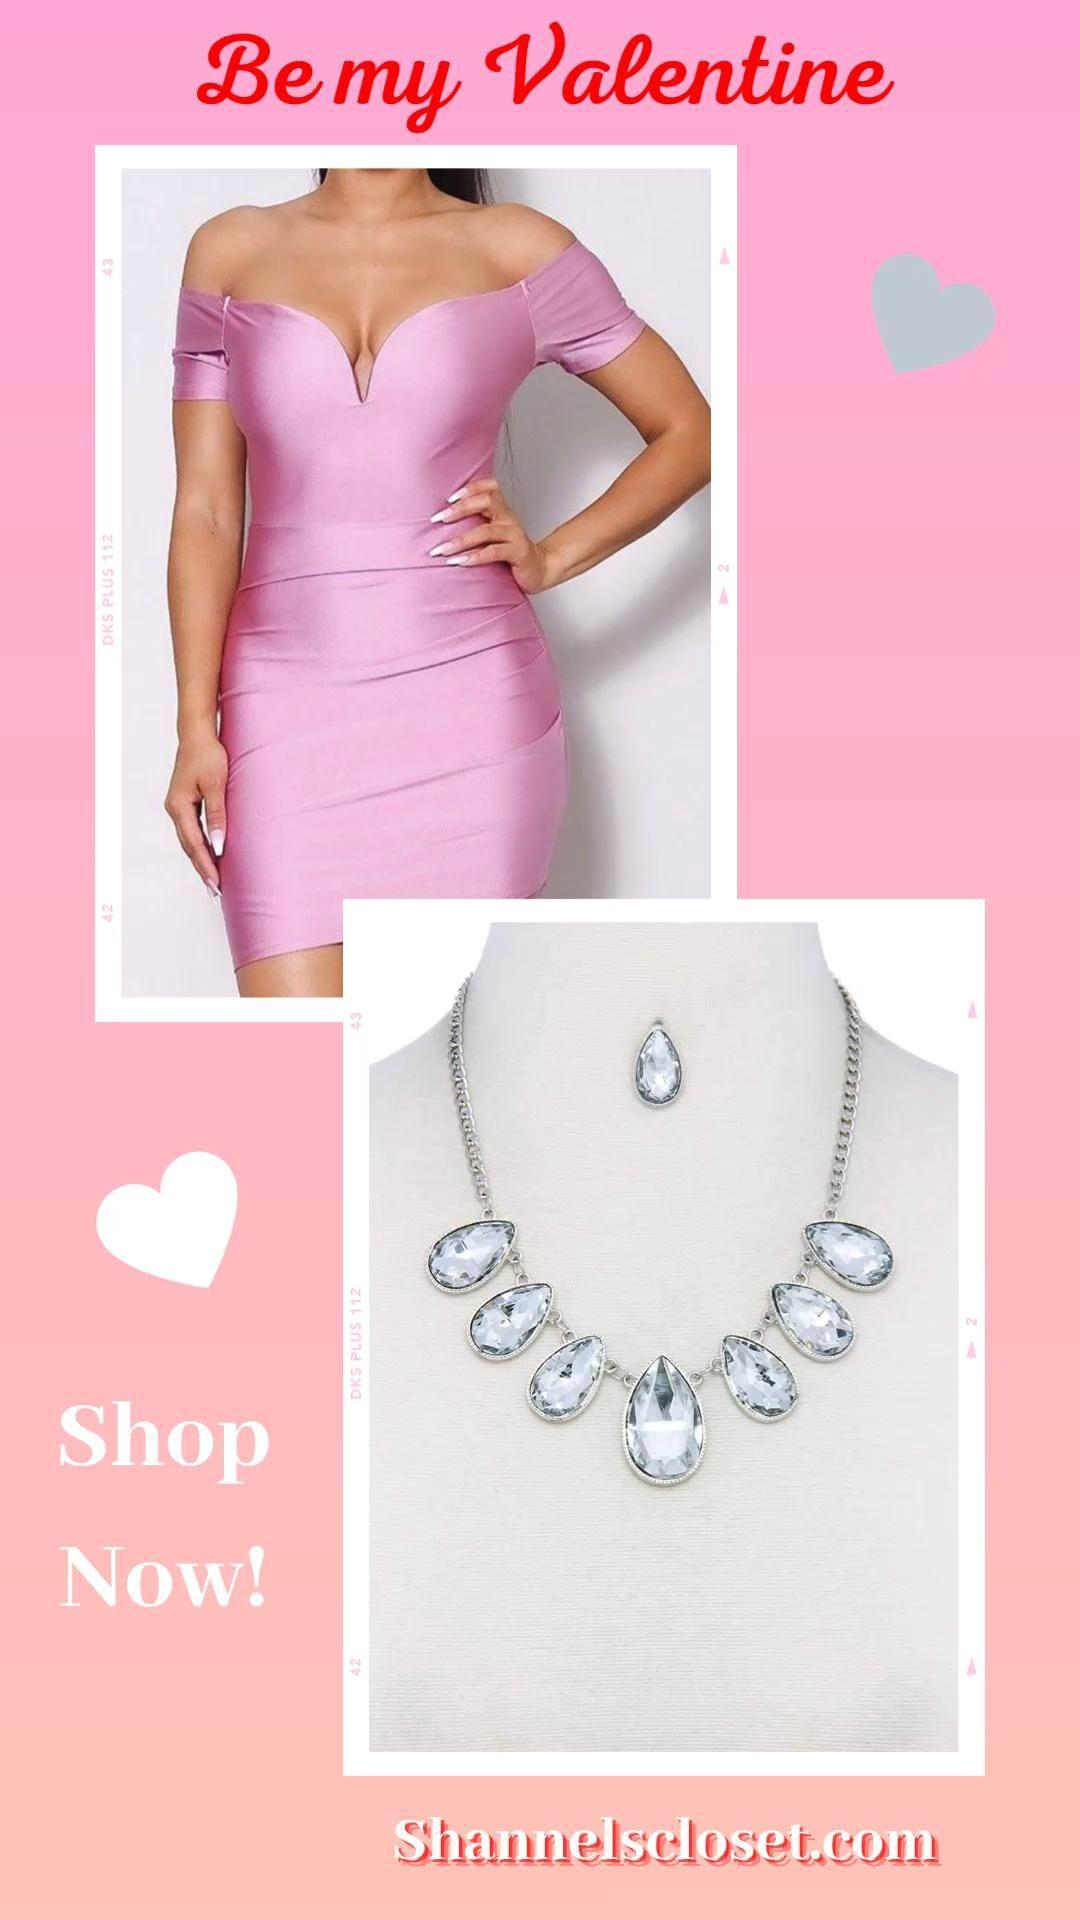 #shopping #fashion #style #shoppingonline #shoppingaddict #shopthelook #newarrivals #dresses #womensclothing #ootd #shopnow #foryoupage #musthaves #accessories #jewelryaddict #jewelry #dressesforwomen